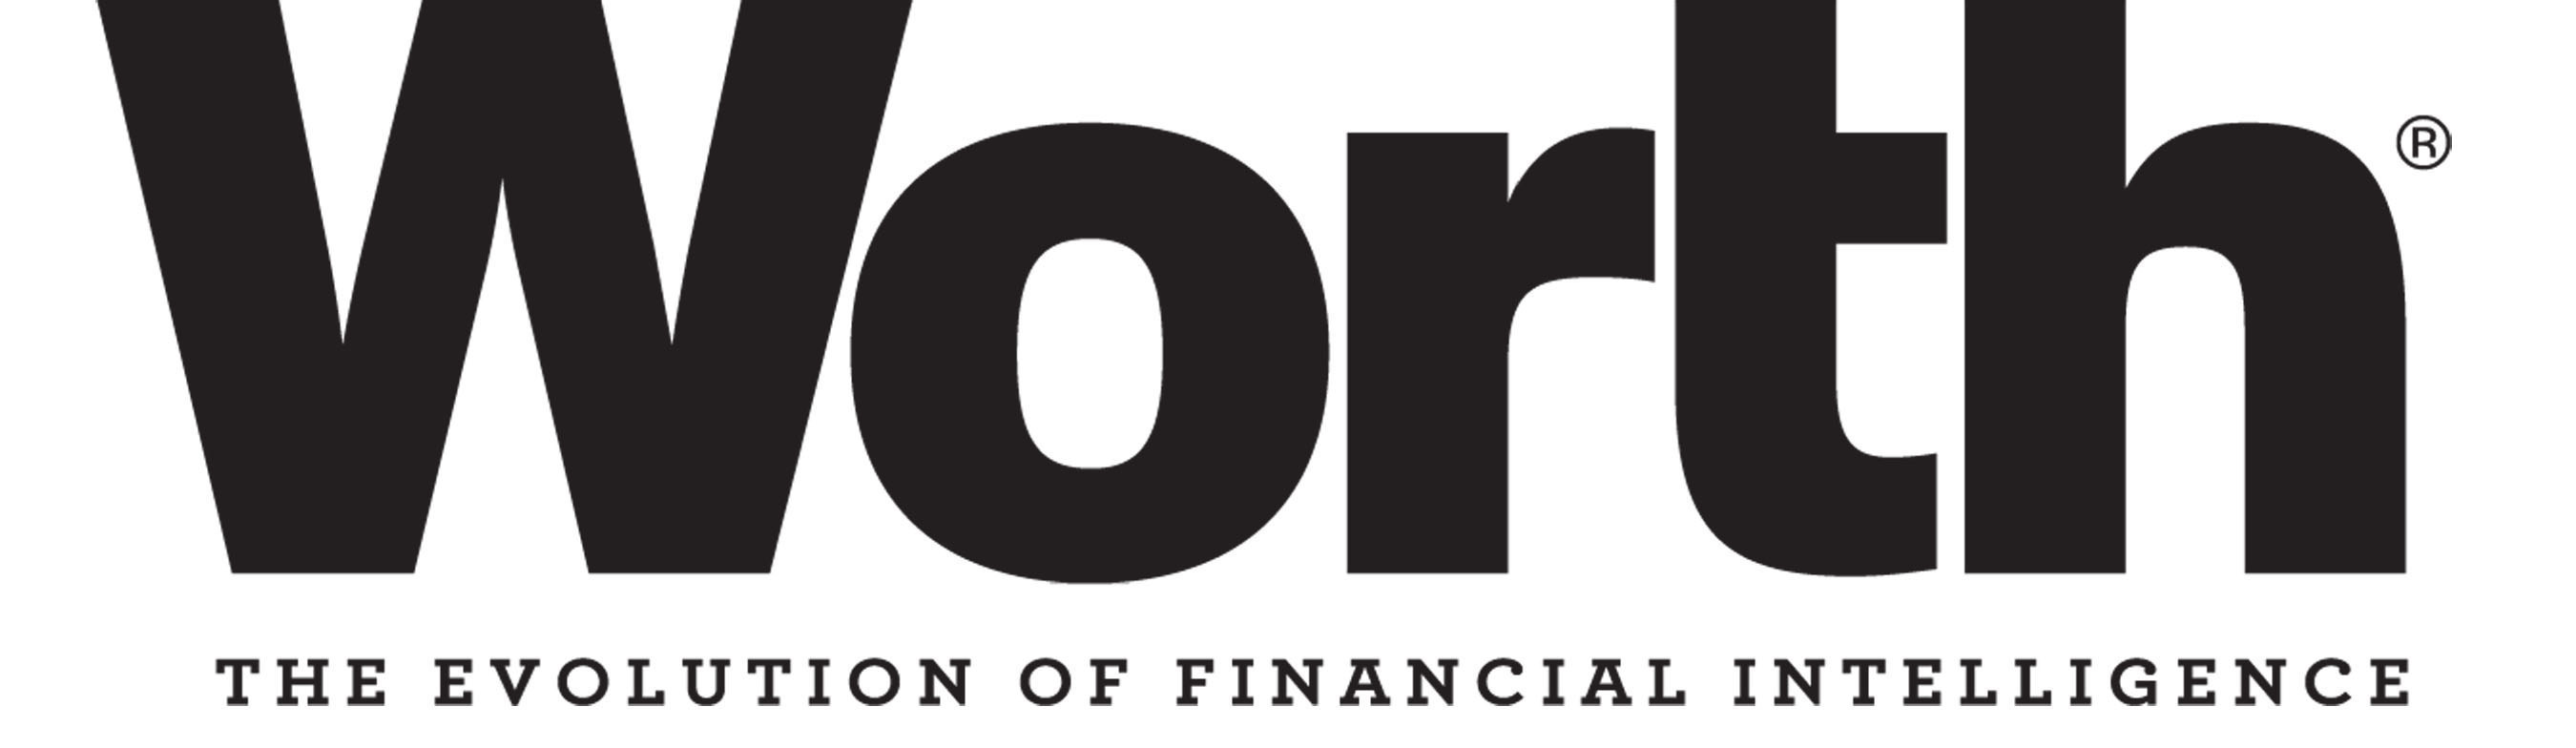 Worth Logo (PRNewsFoto/SANDOW)